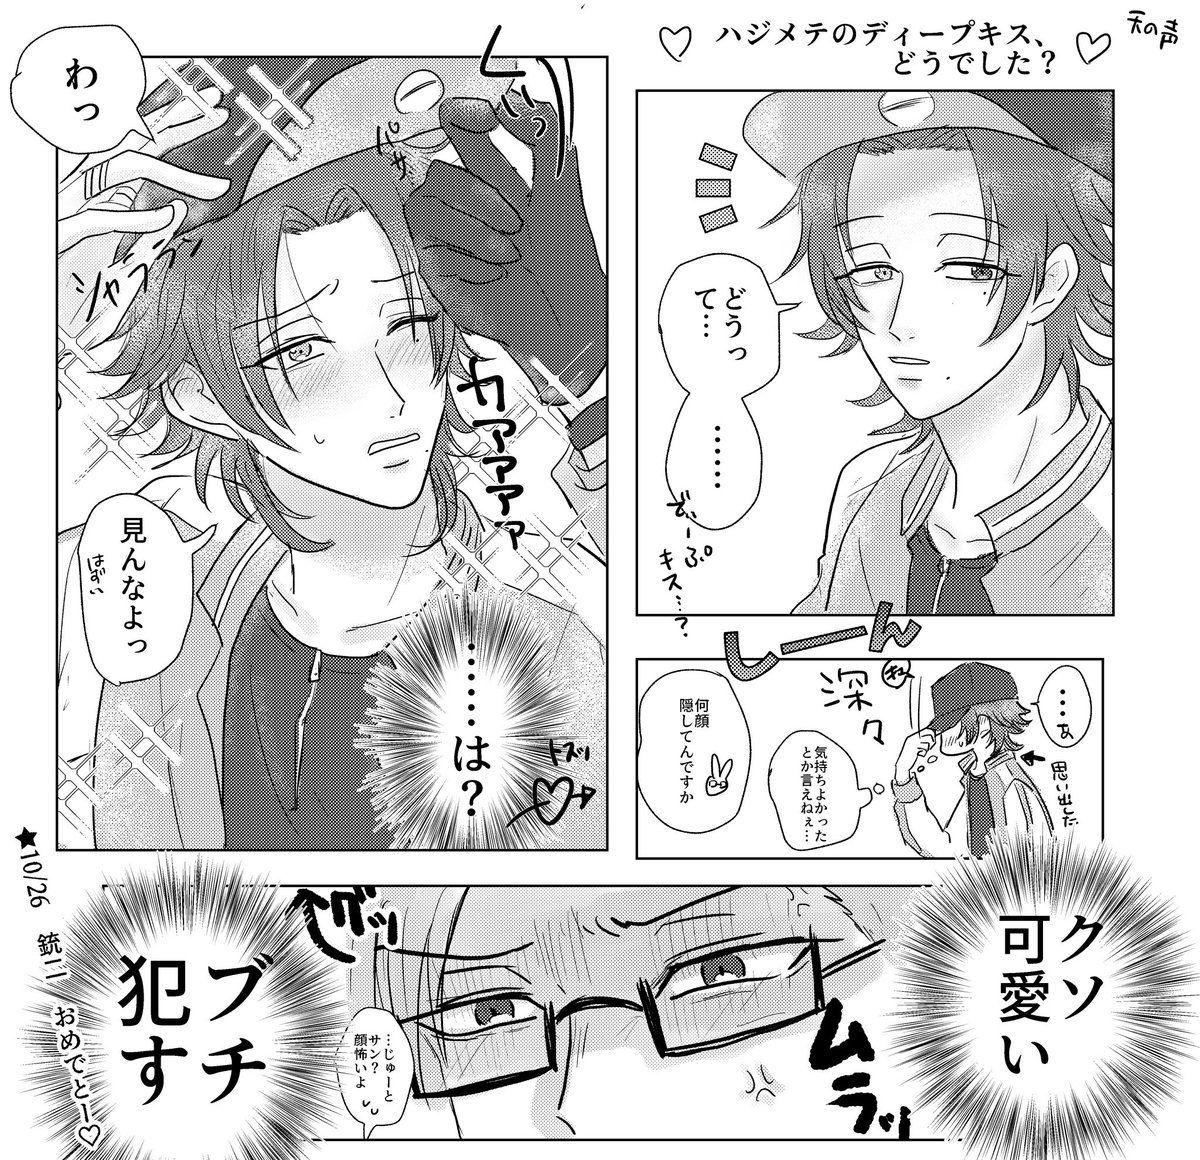 Anime, Rap battle, Fictional characters